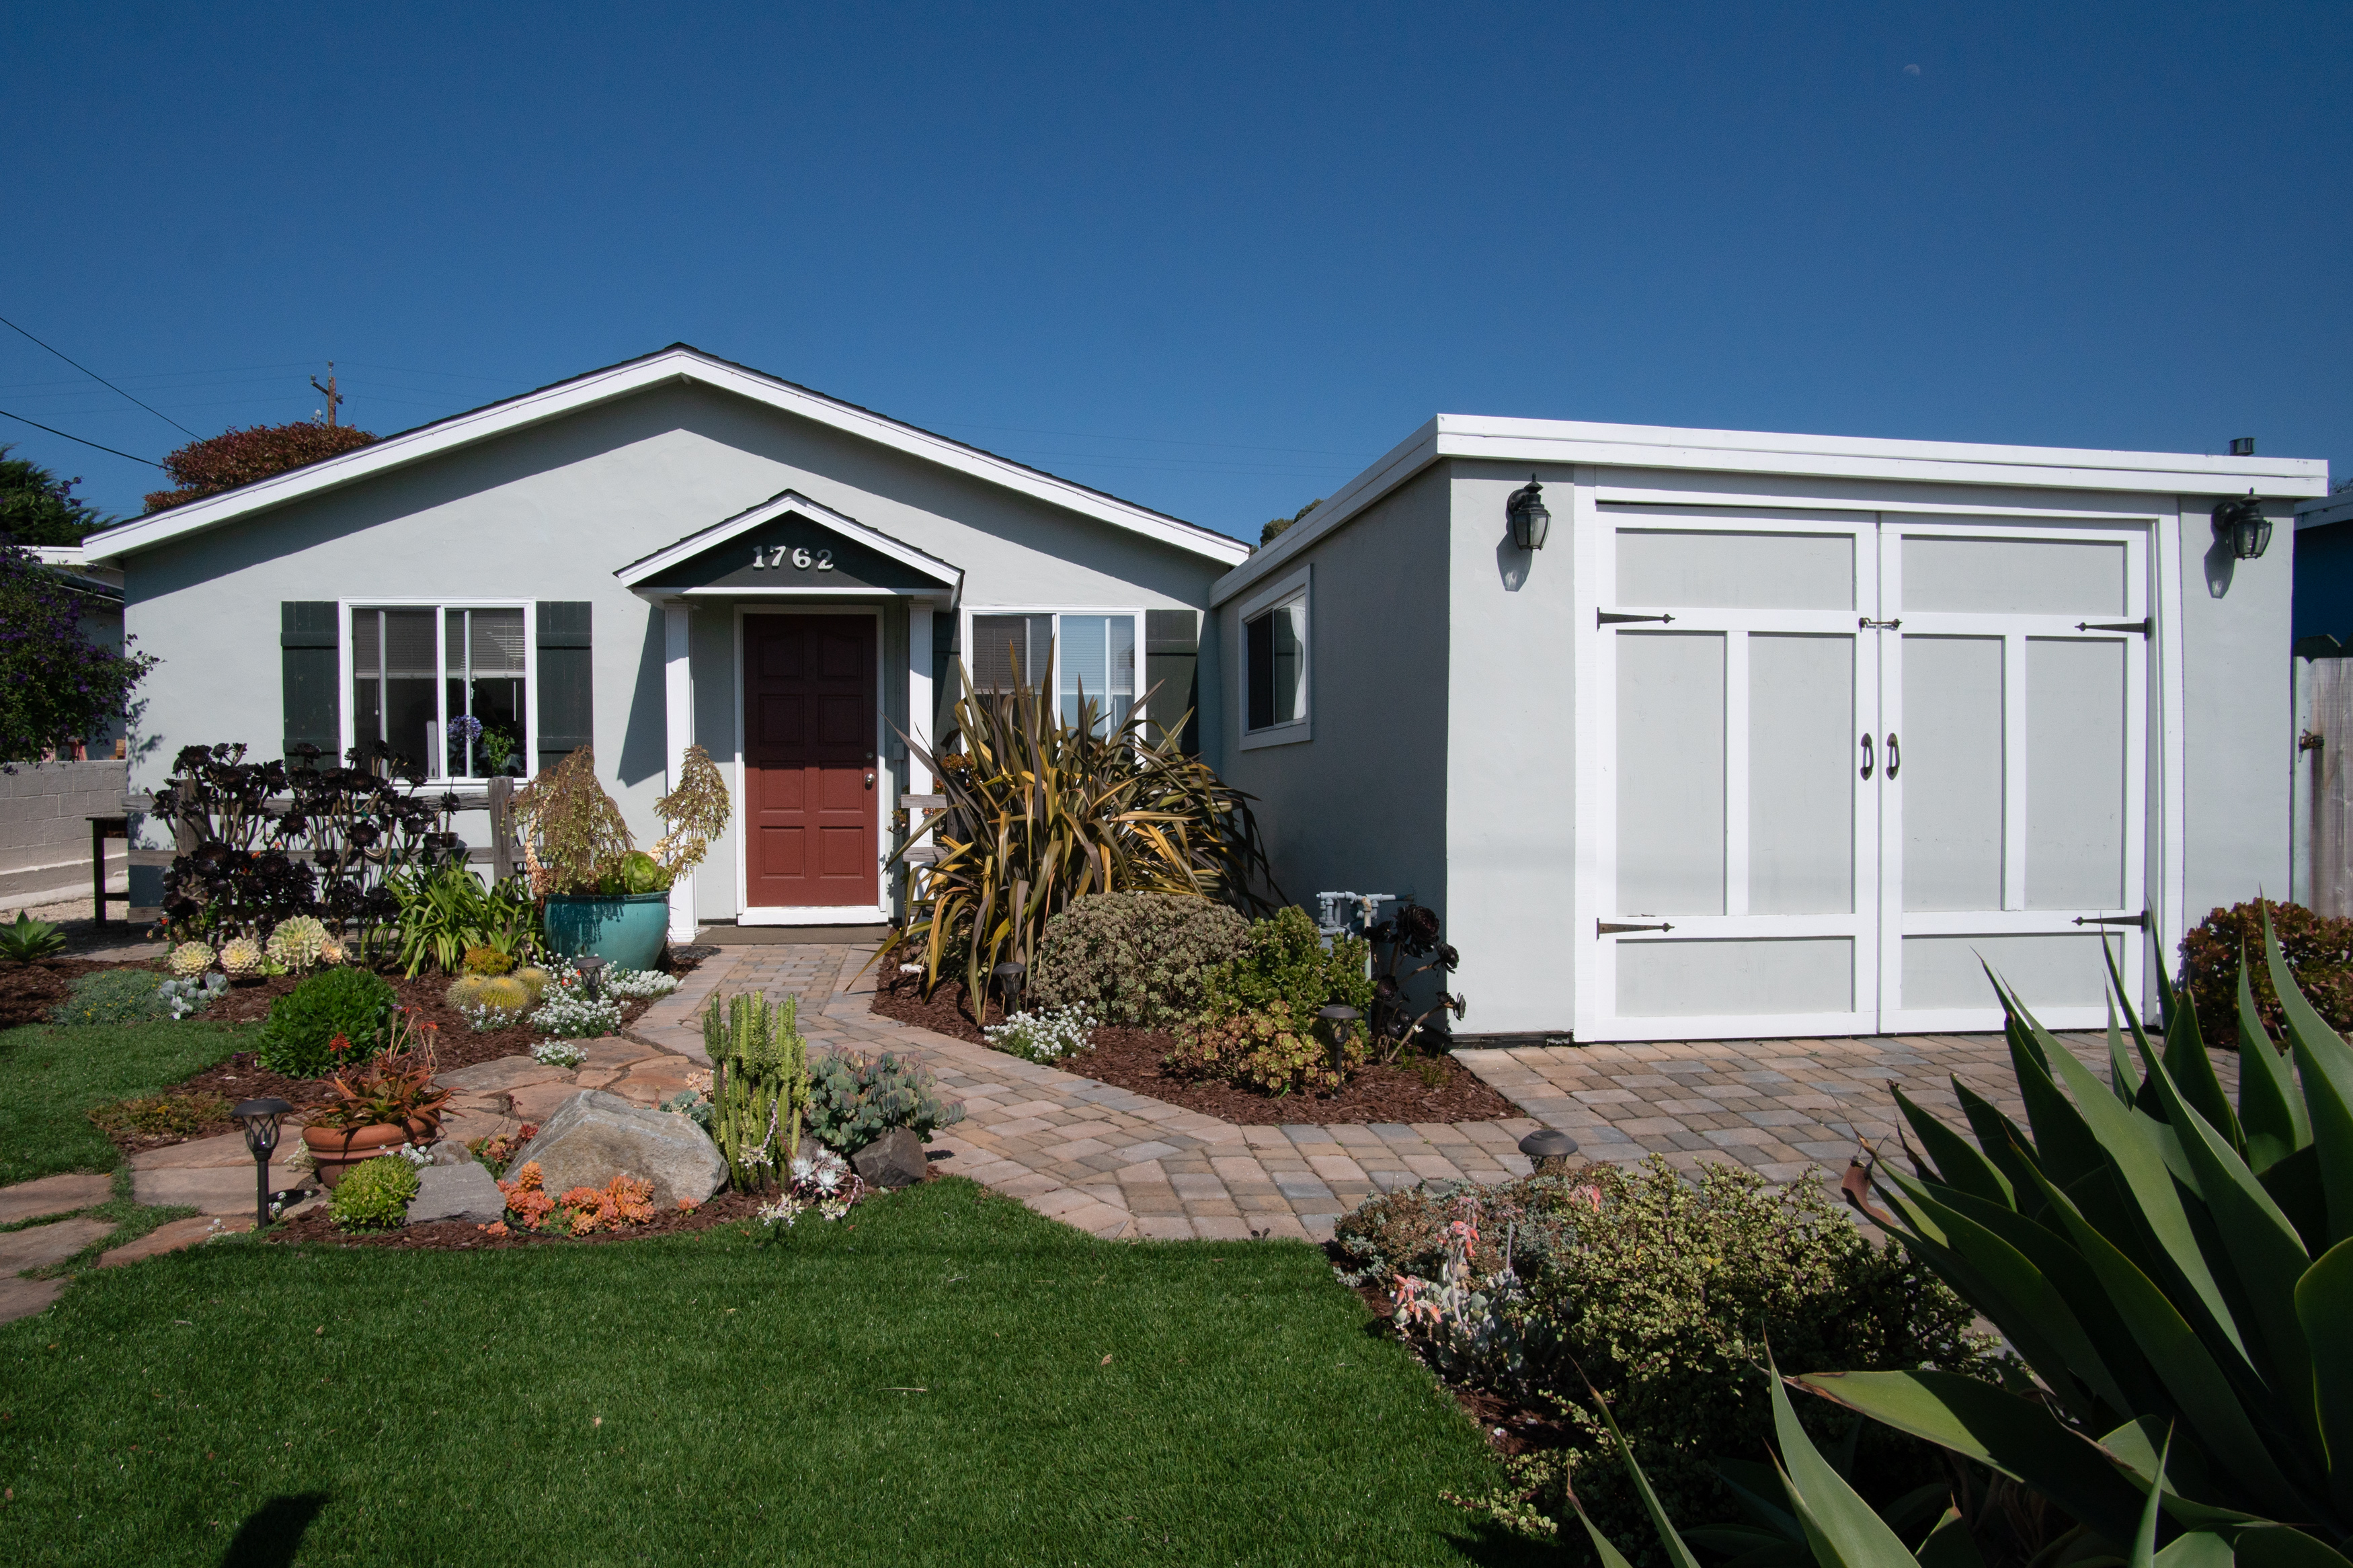 1762 Mendocino St, Seaside CA 93955